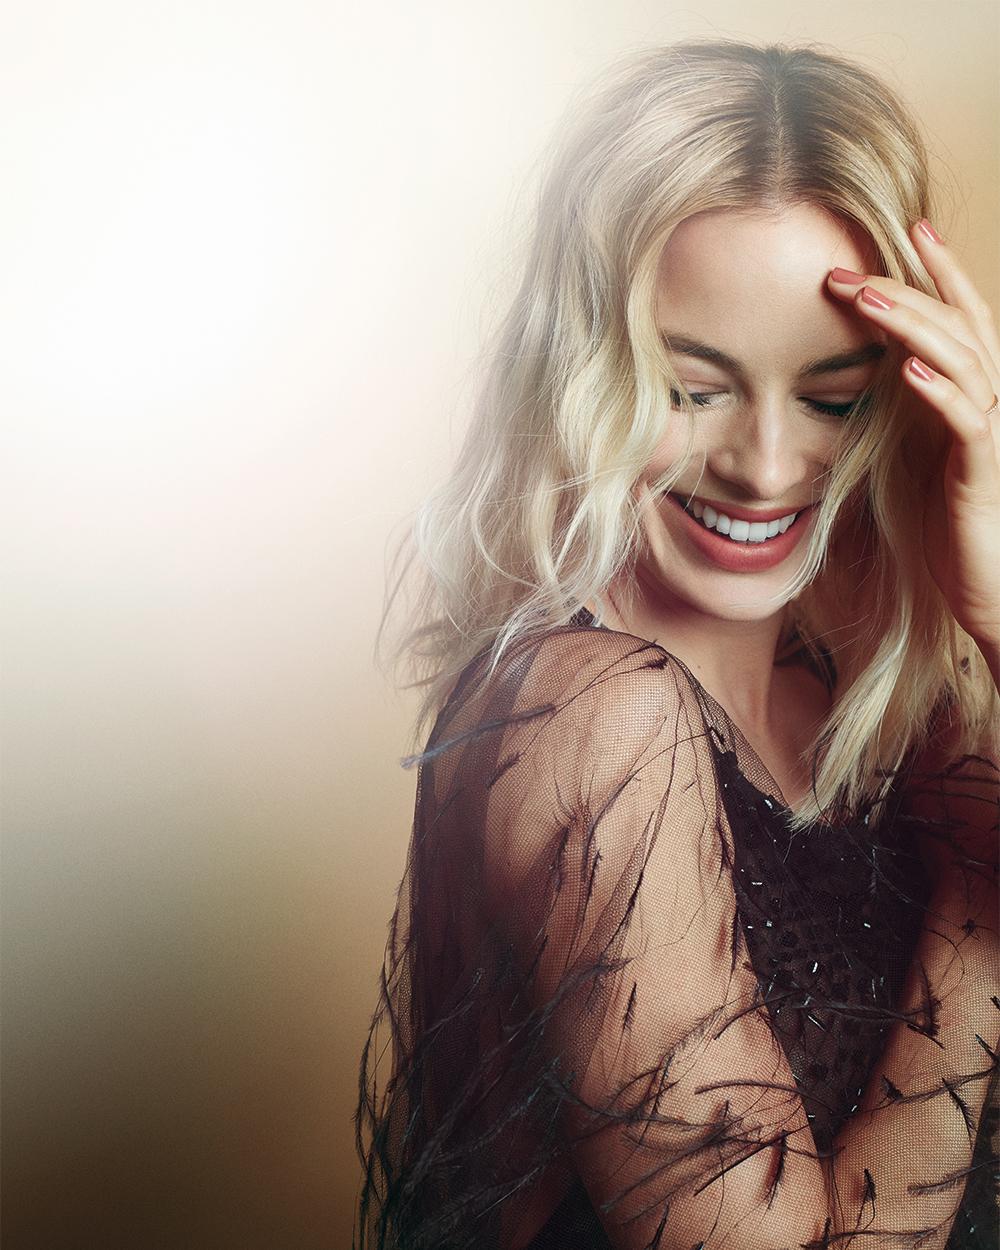 Margot Robbie Variety Cover Story